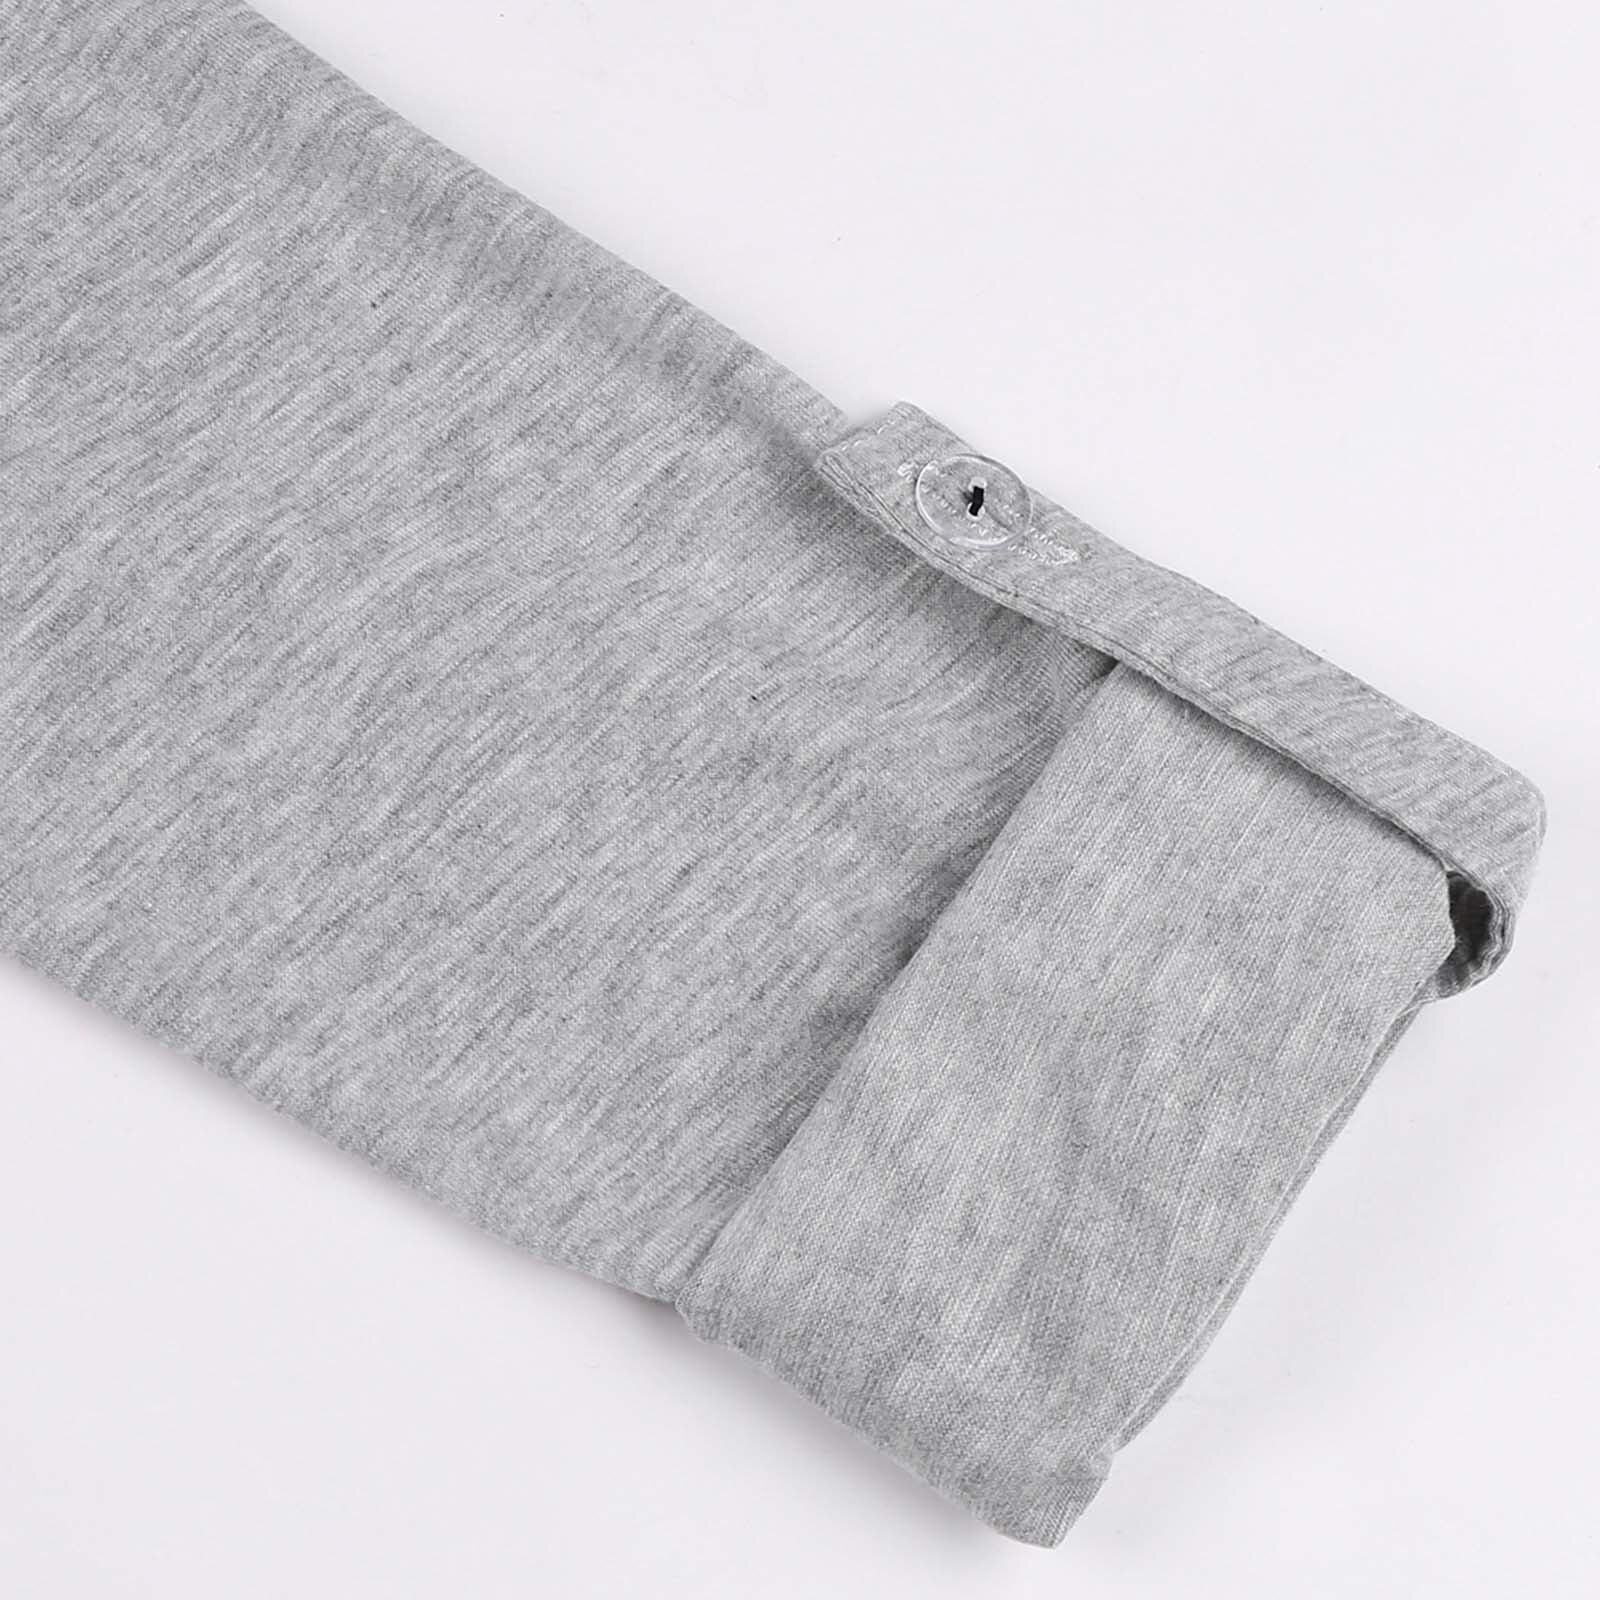 nova camisa de maternidade roupa cor 04